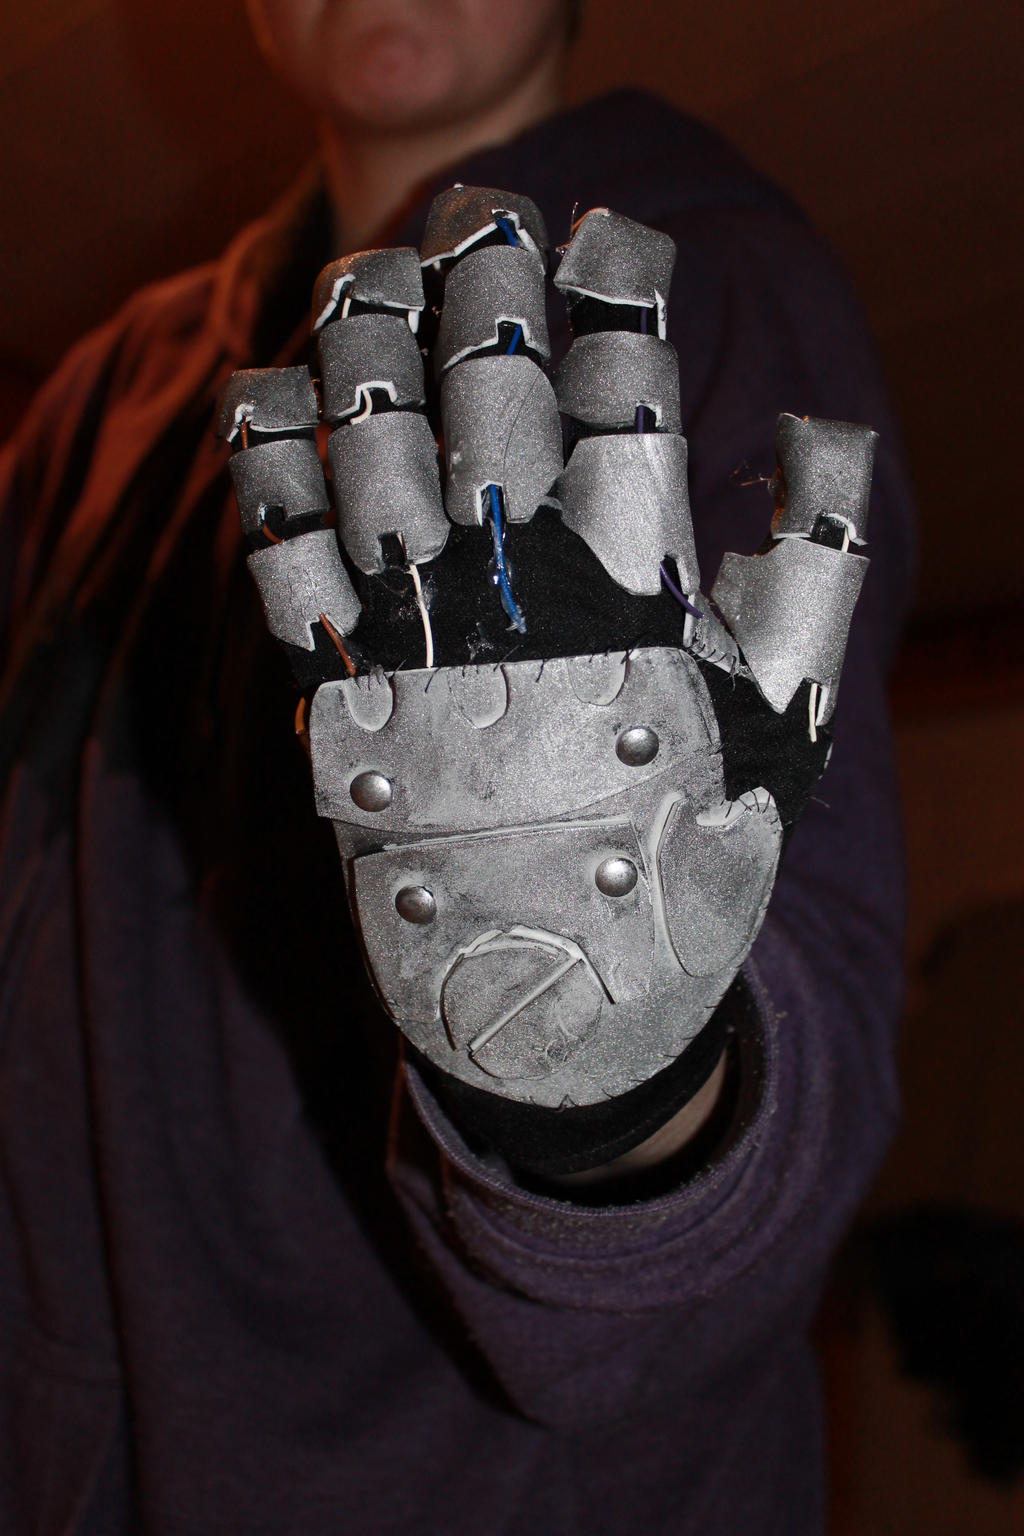 Robot hand by flammingcorn